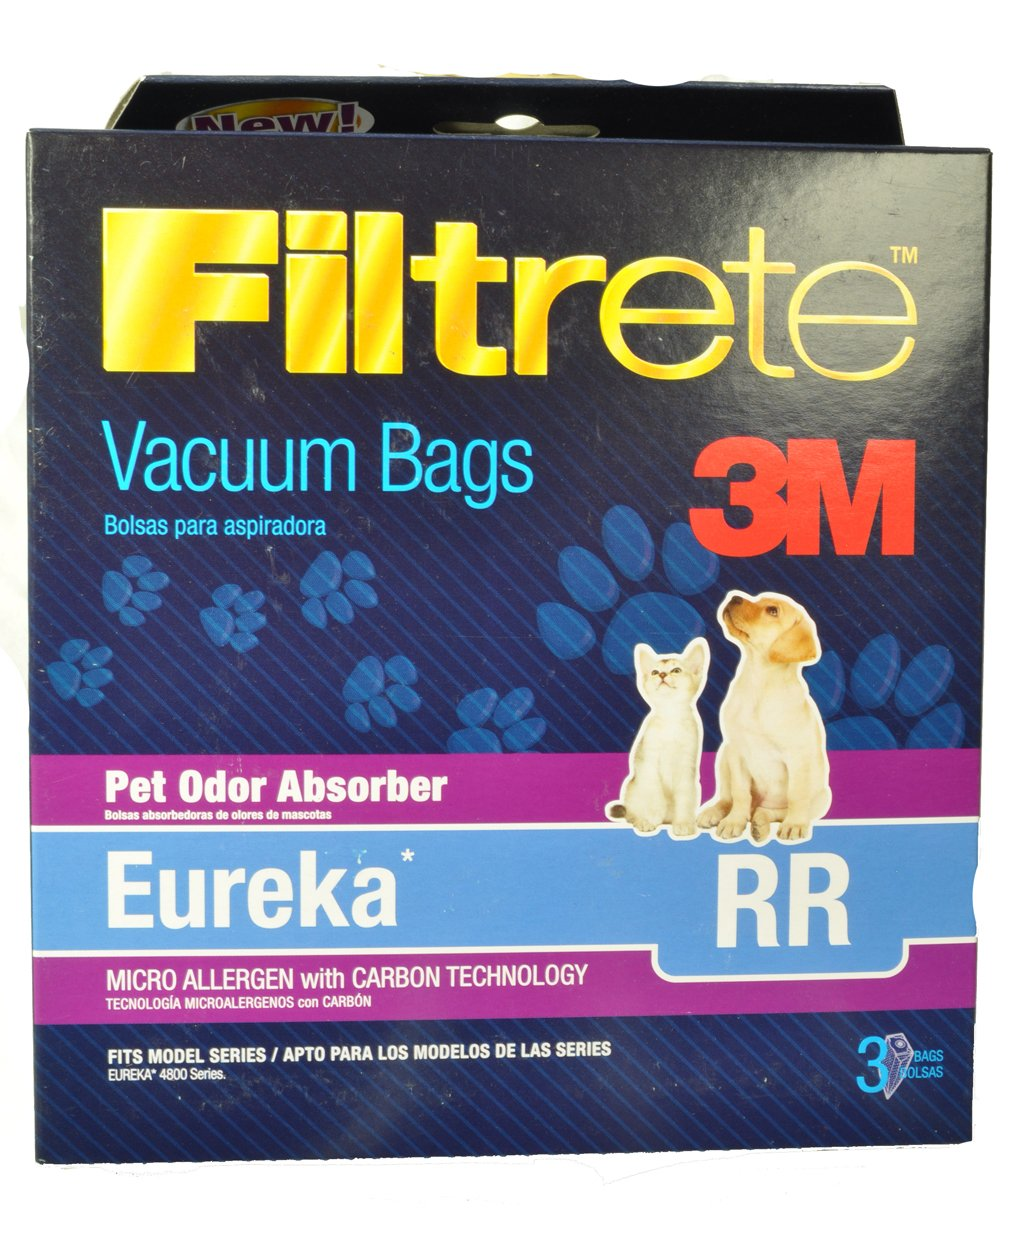 3M EUREKA RR ANTIMICROBIAL BAG by Filtrete